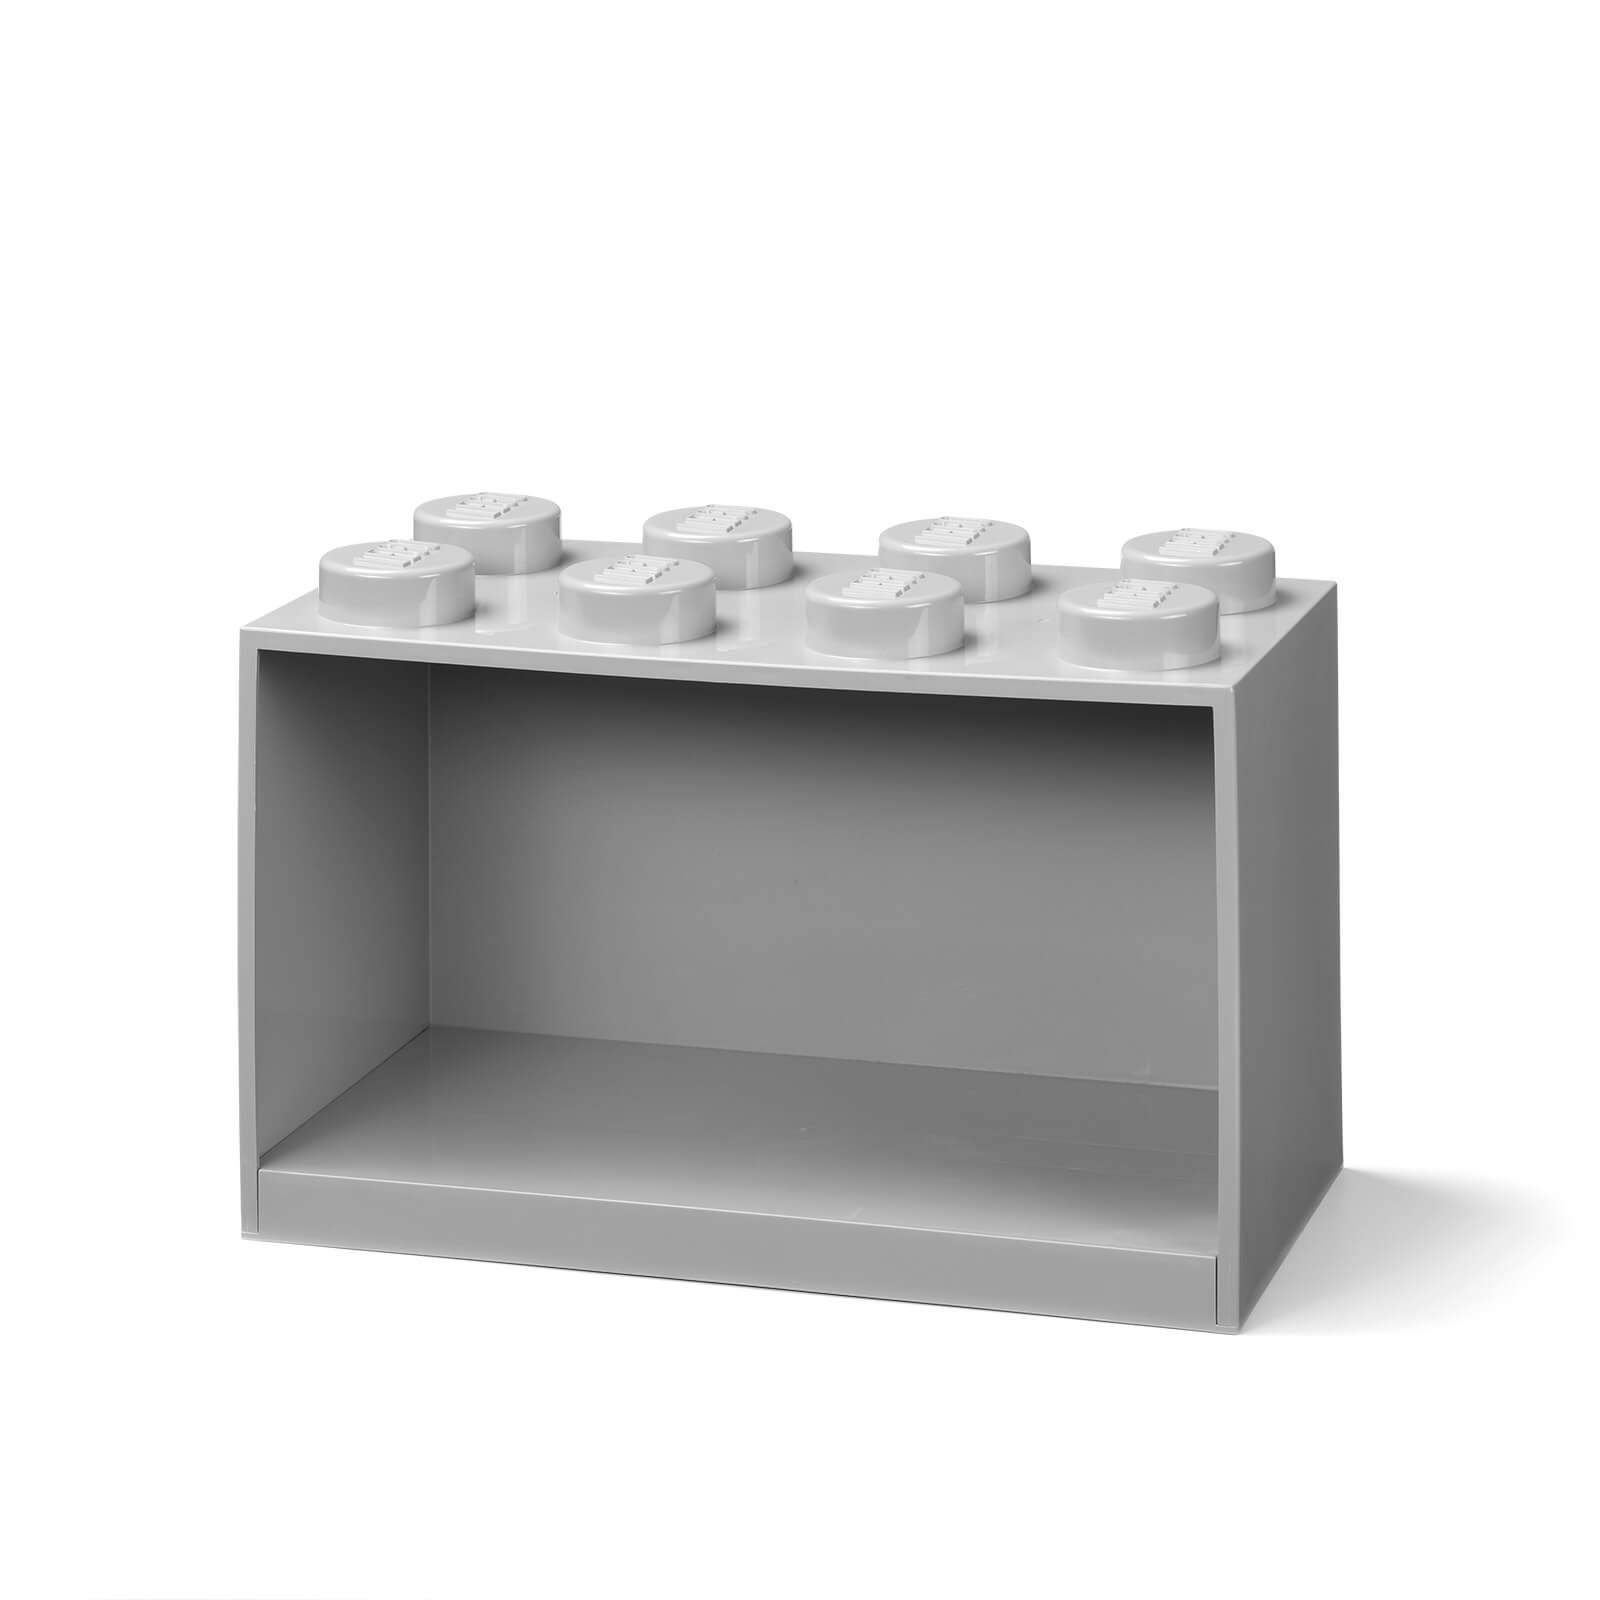 Image of LEGO Storage Brick Shelf 8 - Grey